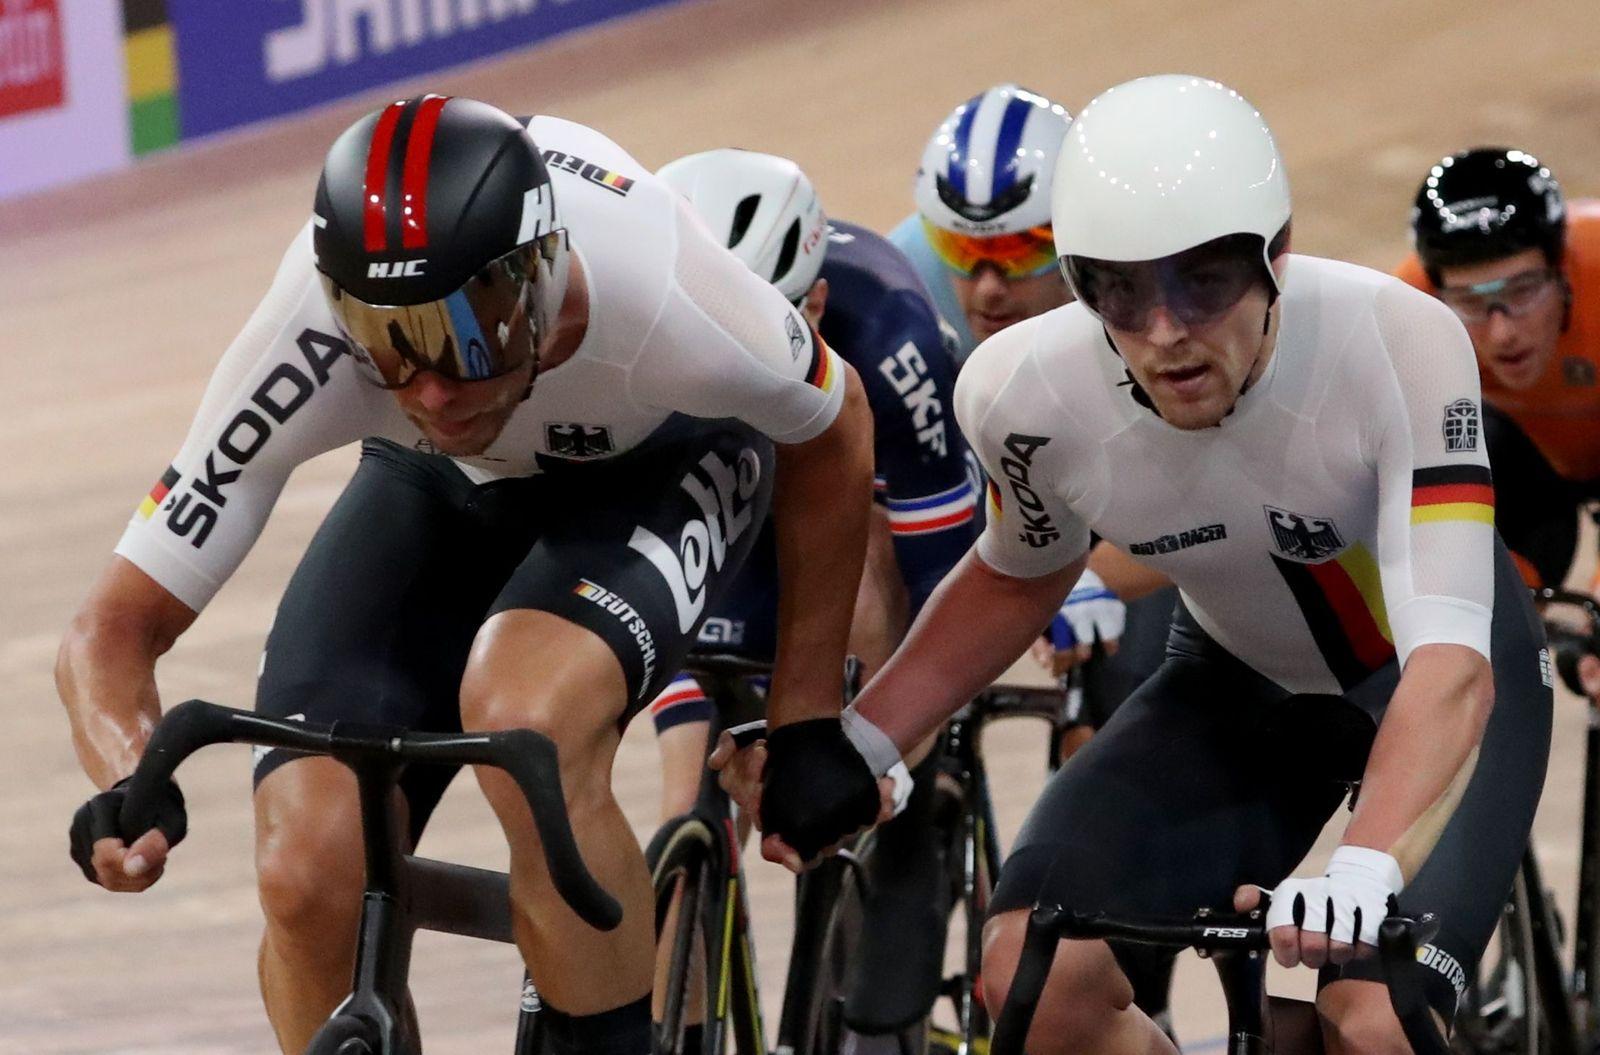 UCI Track Cycling World Championships, Berlin, Germany - 01 Mar 2020